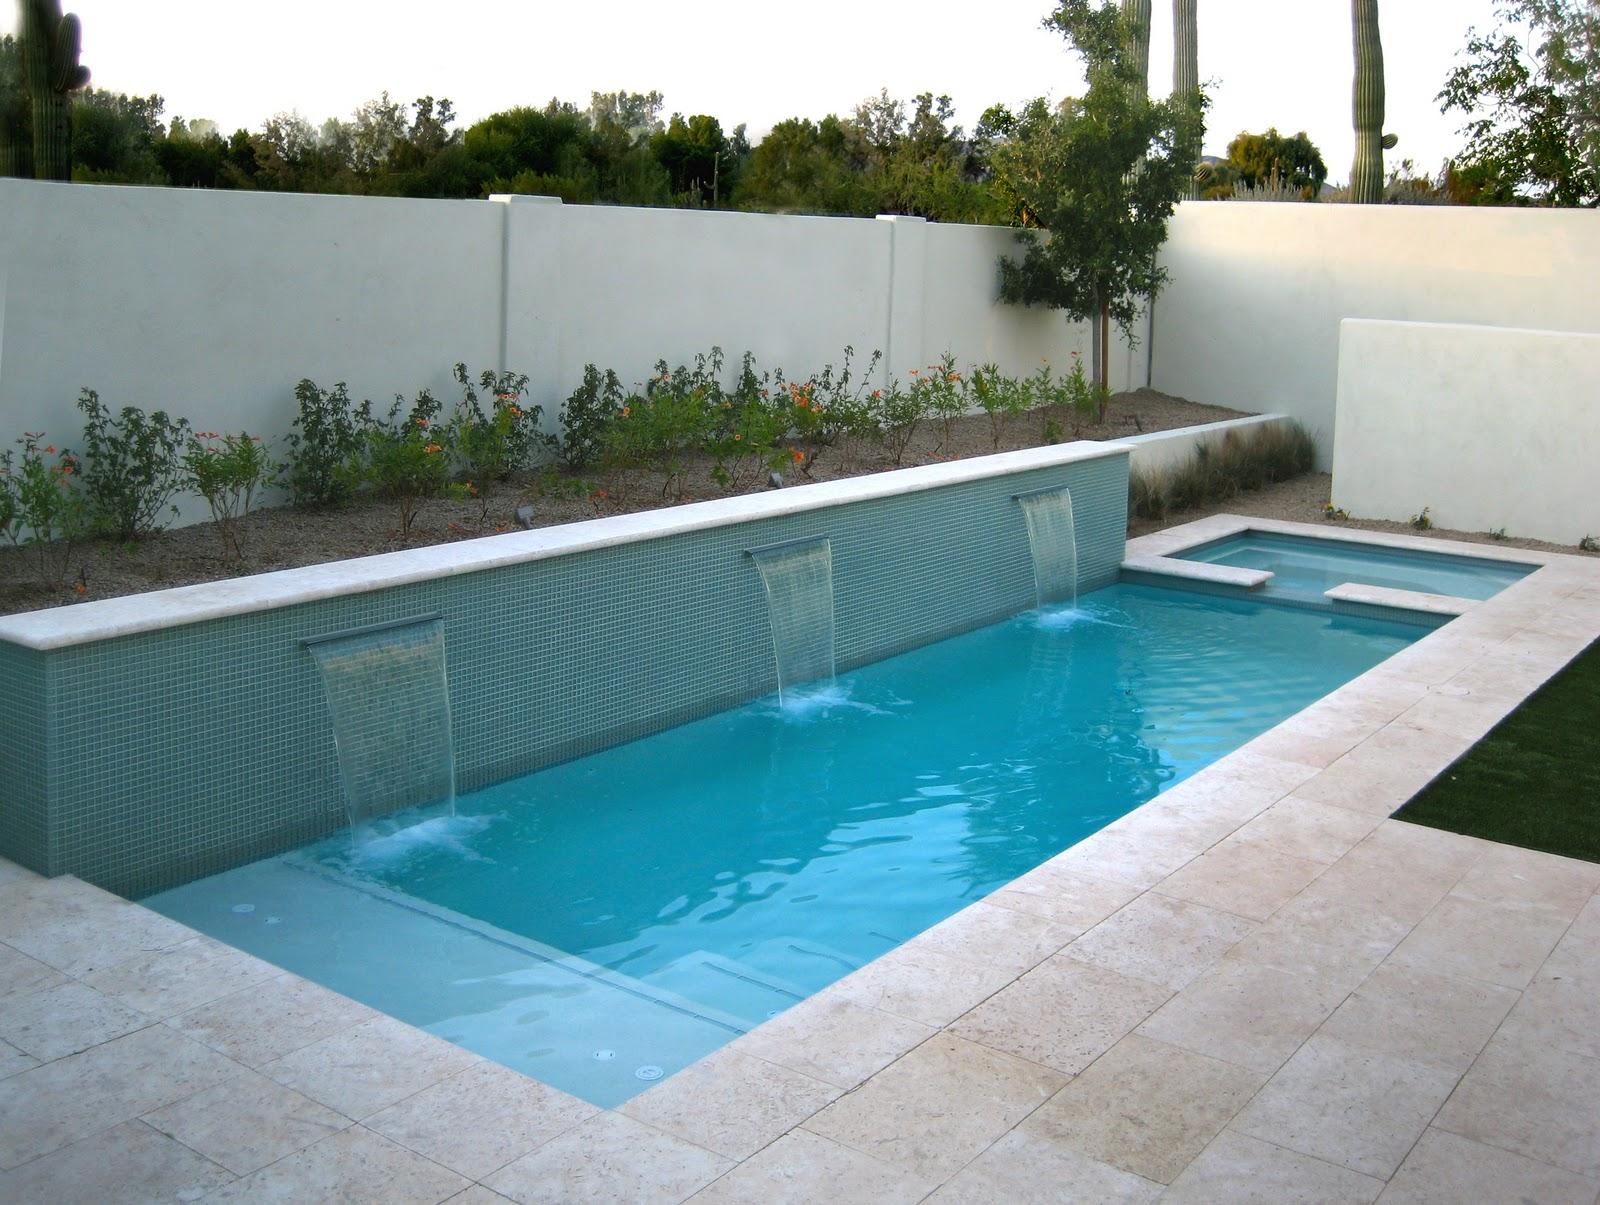 backyard swimming pool designs photo - 10